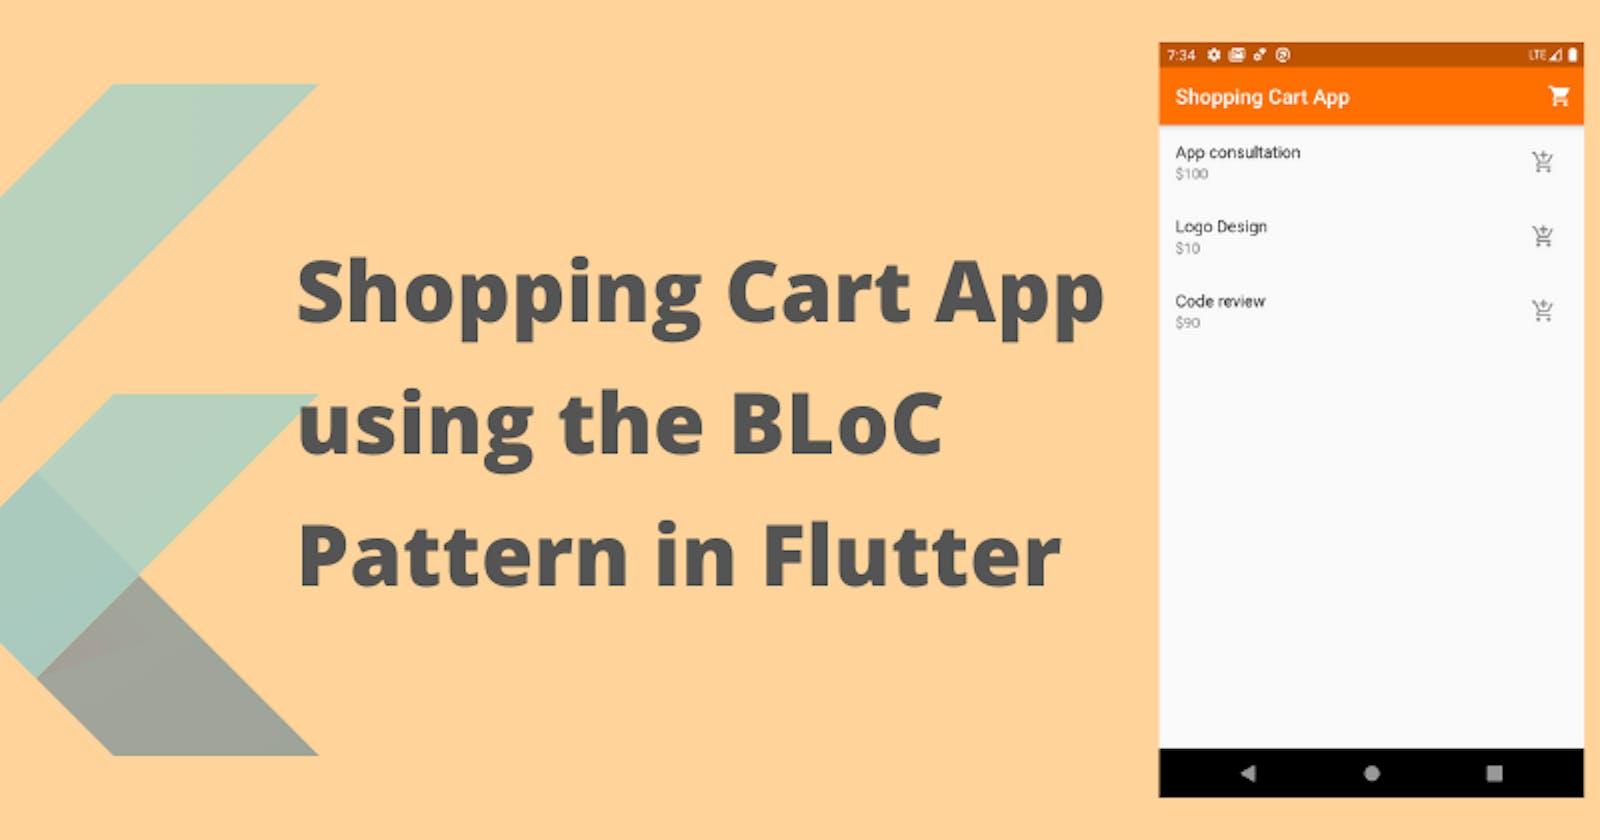 Shopping cart app using BLoC pattern in Flutter